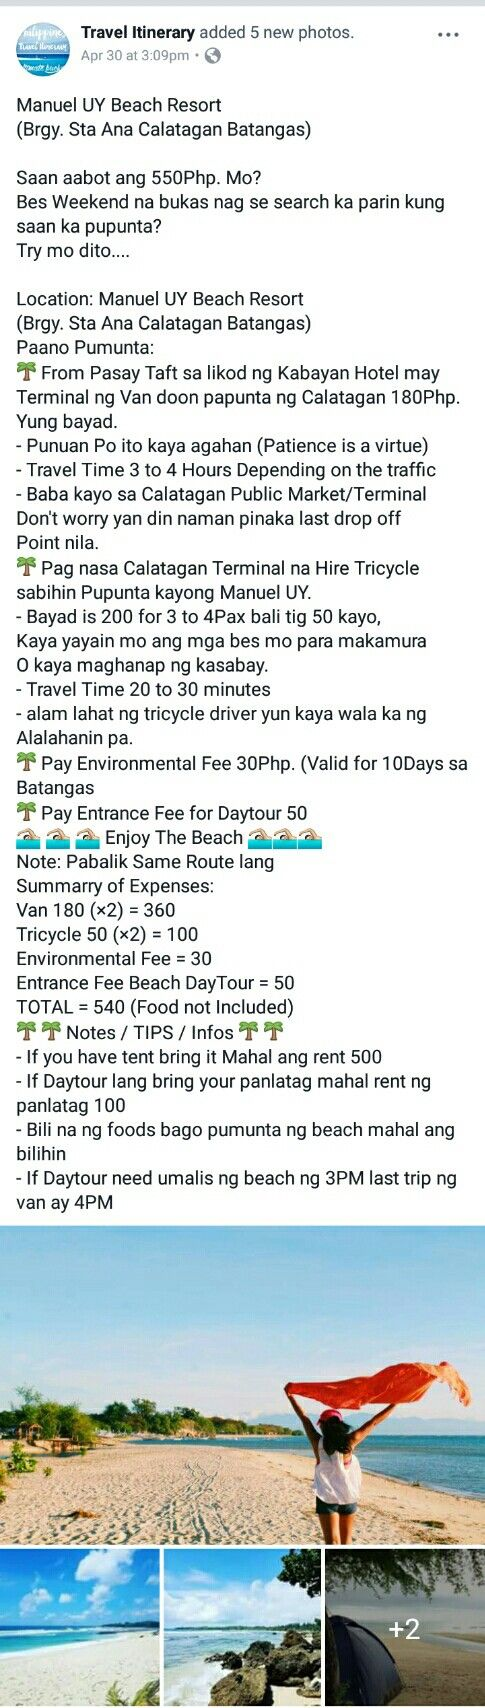 Manuel Uy Beach Resort Brgy Sta Ana, Calatagan Batangas